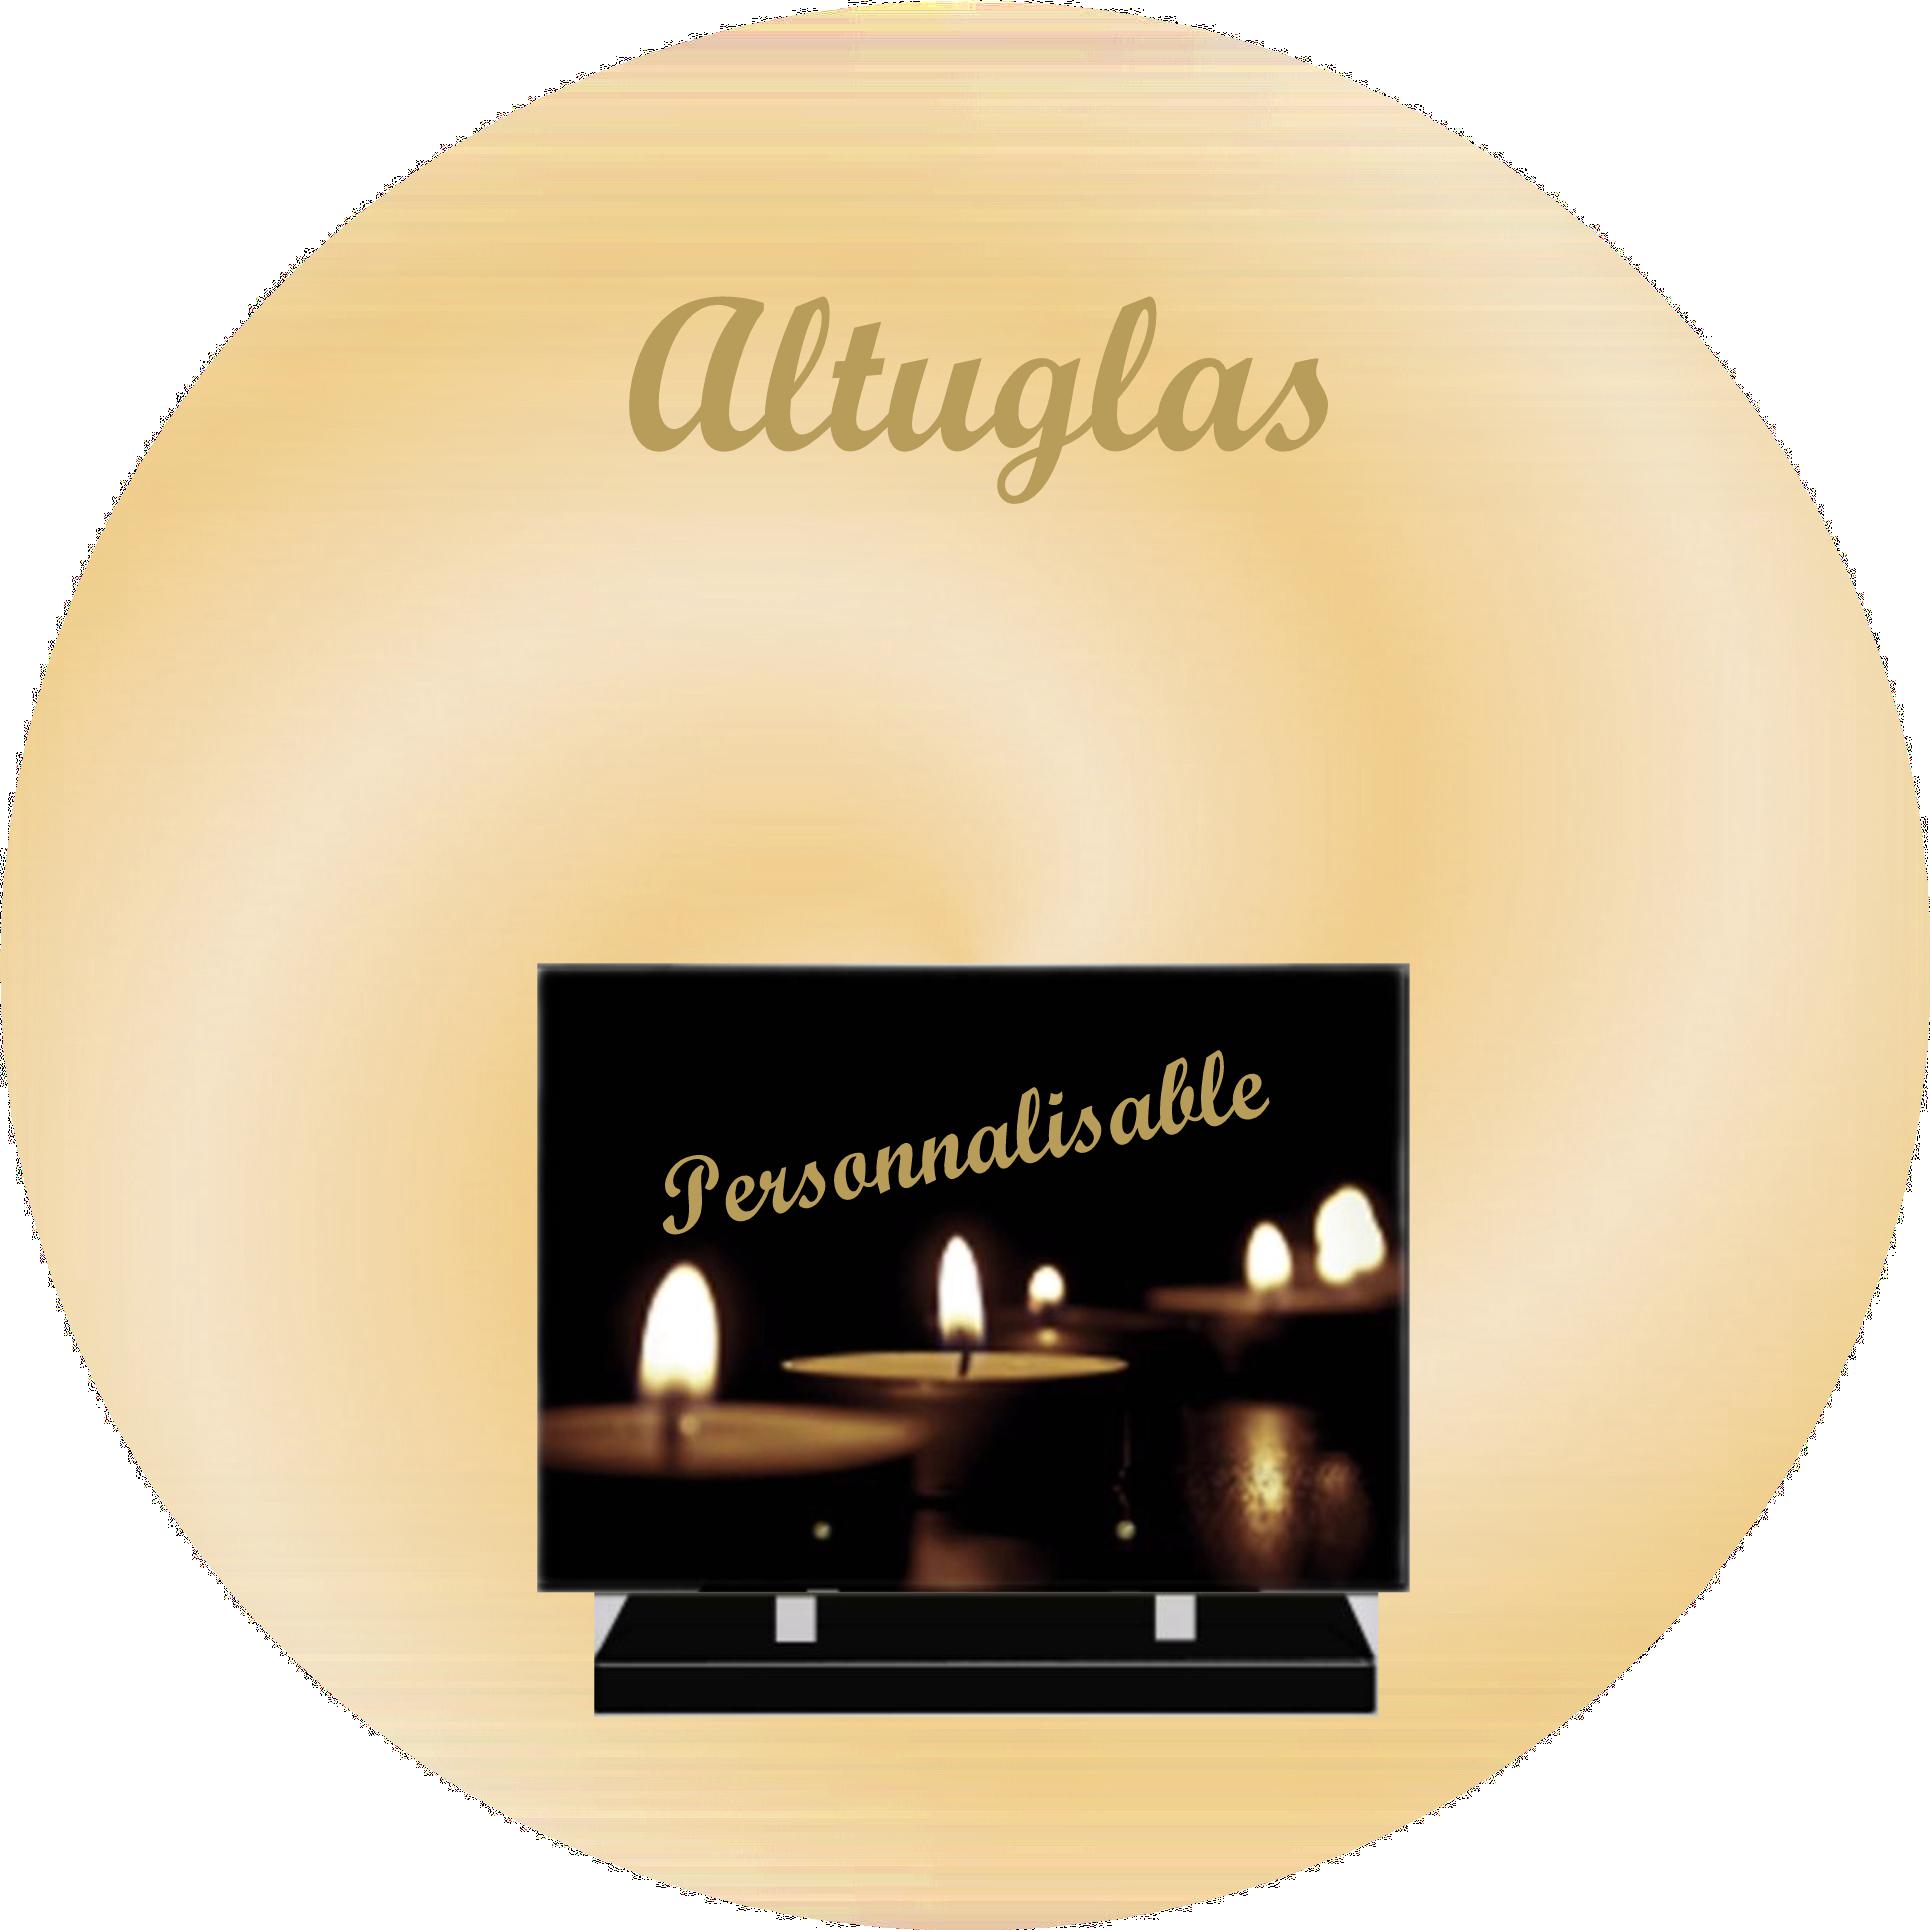 plaques altuglas personnalisables